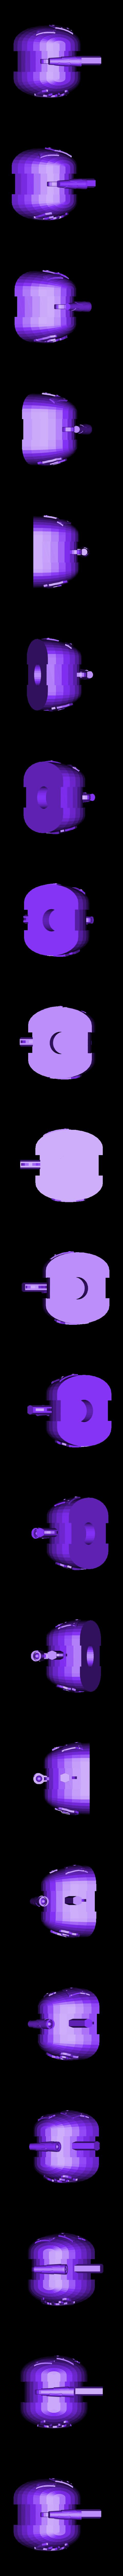 rocket_base.stl Download free STL file KustomWagon (blown apart) • 3D printable object, Savex